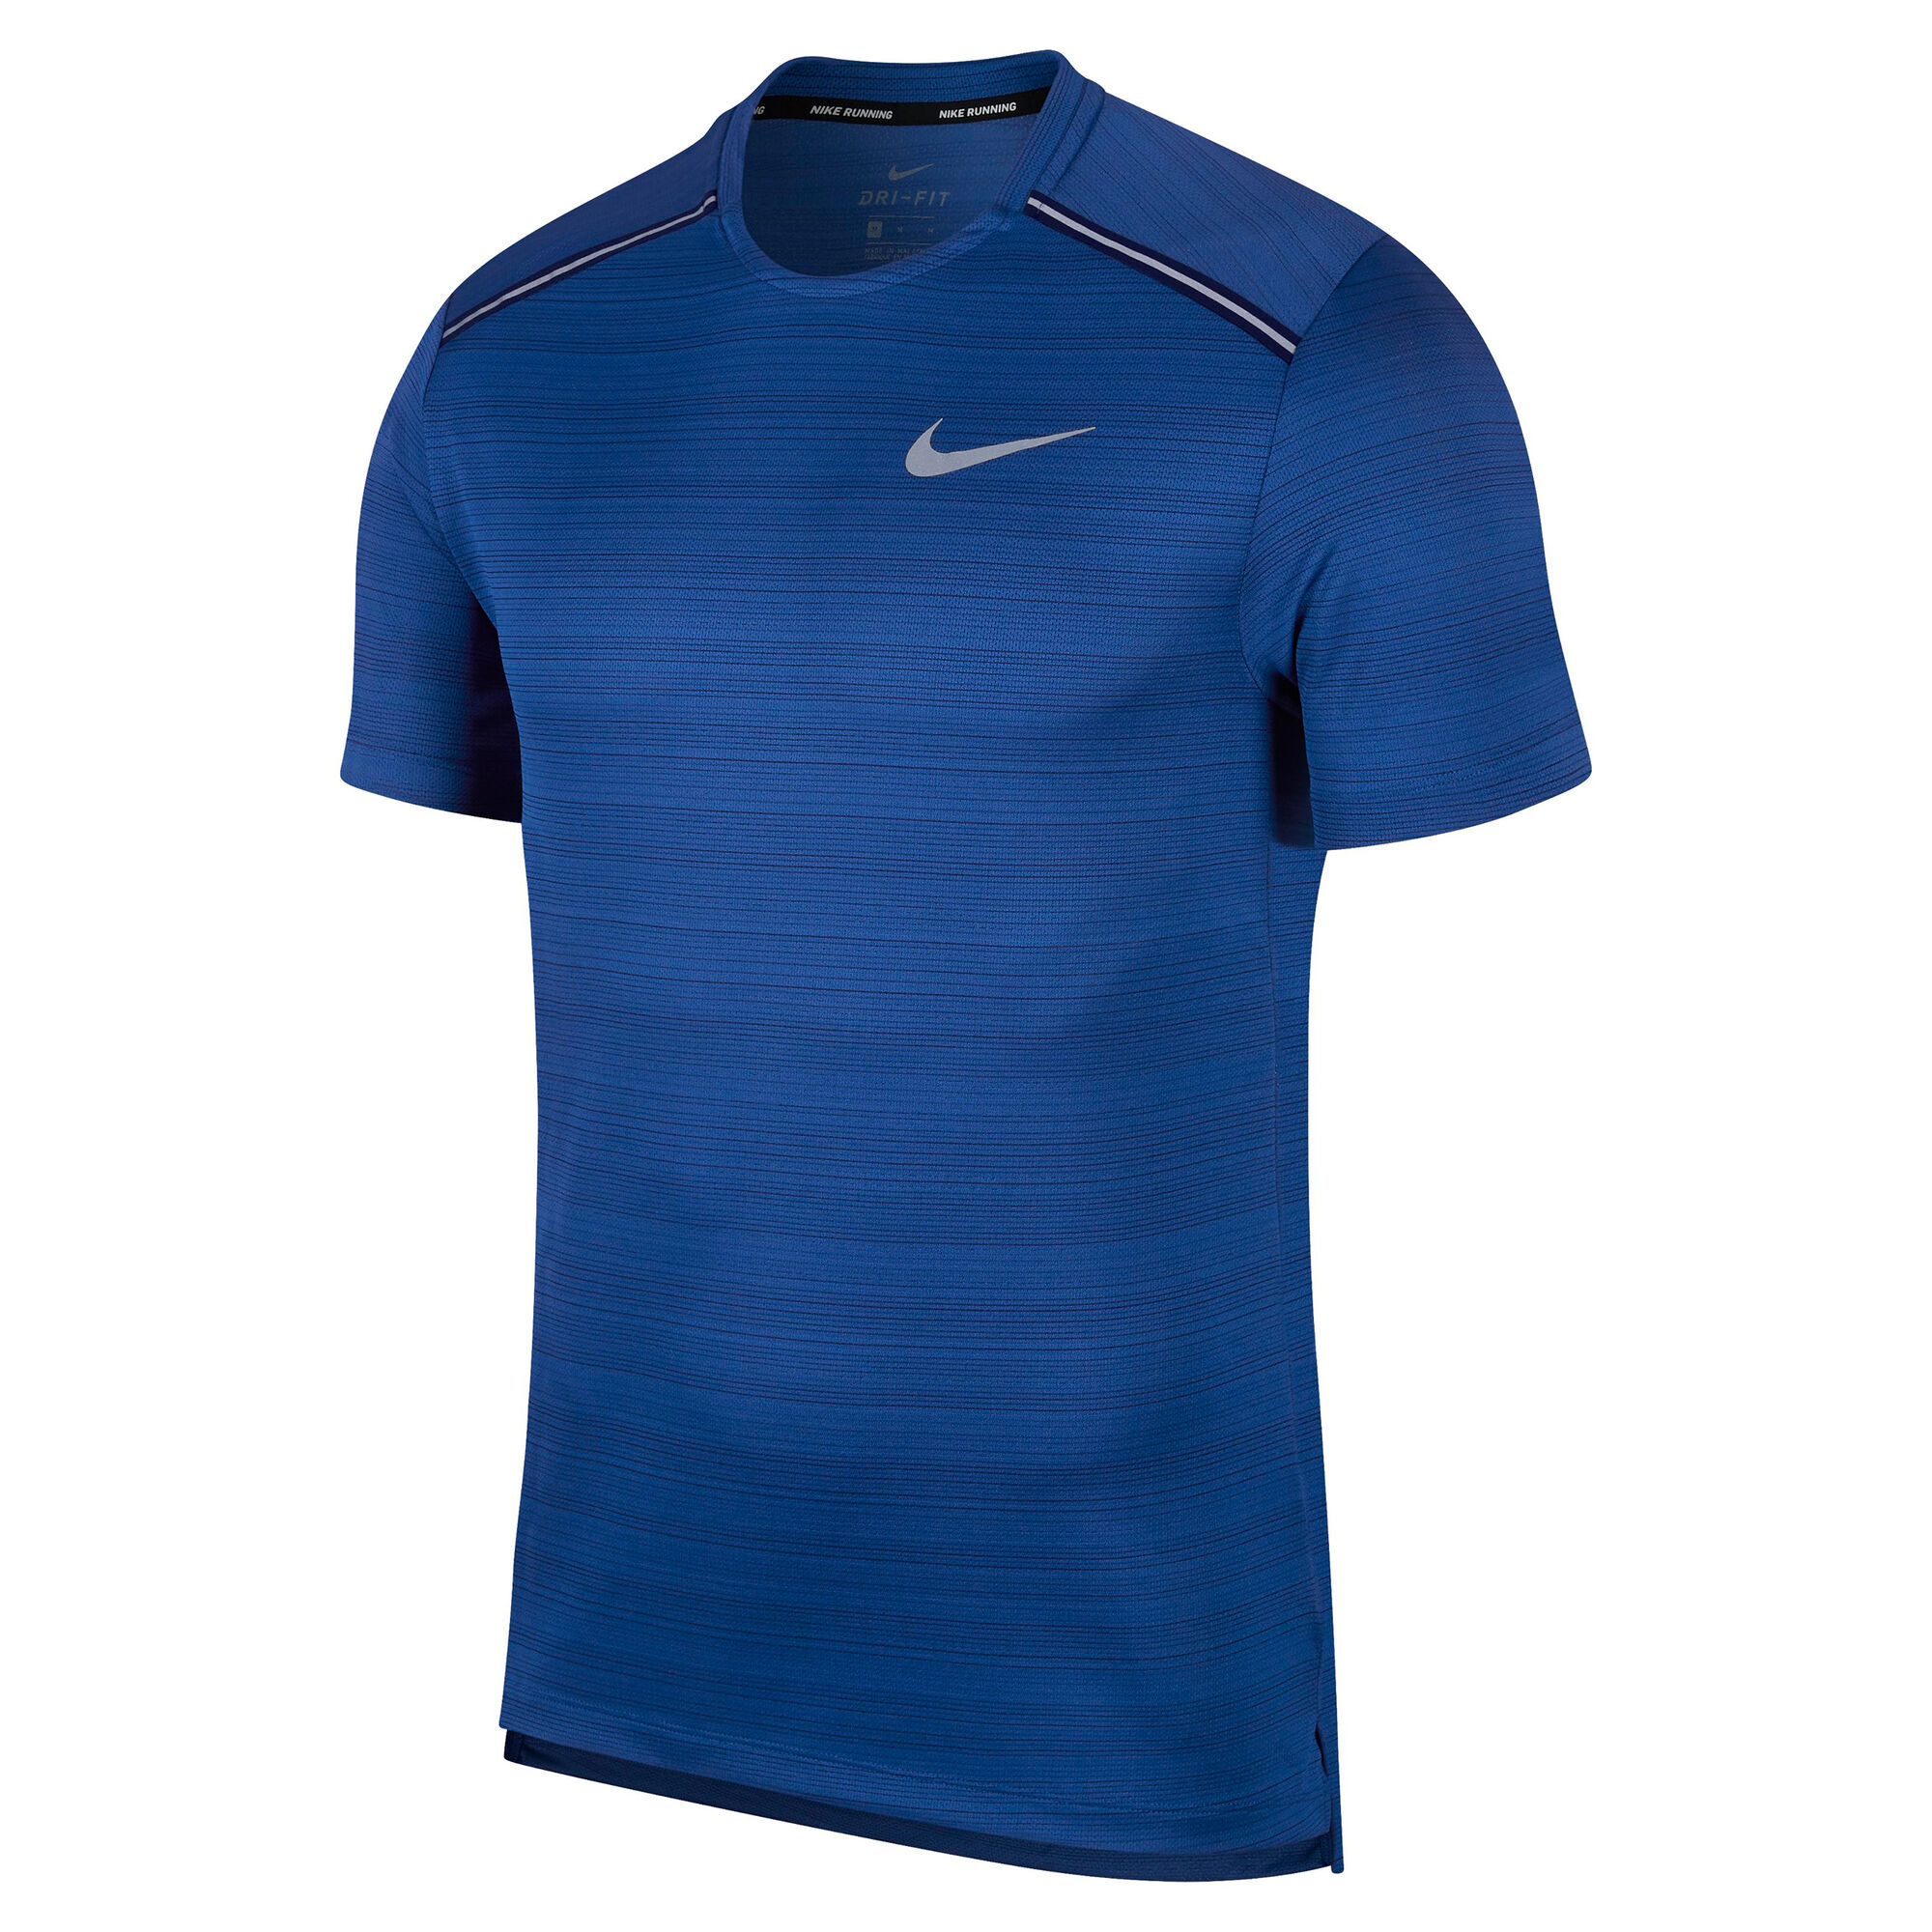 Nike T Shirt Blau